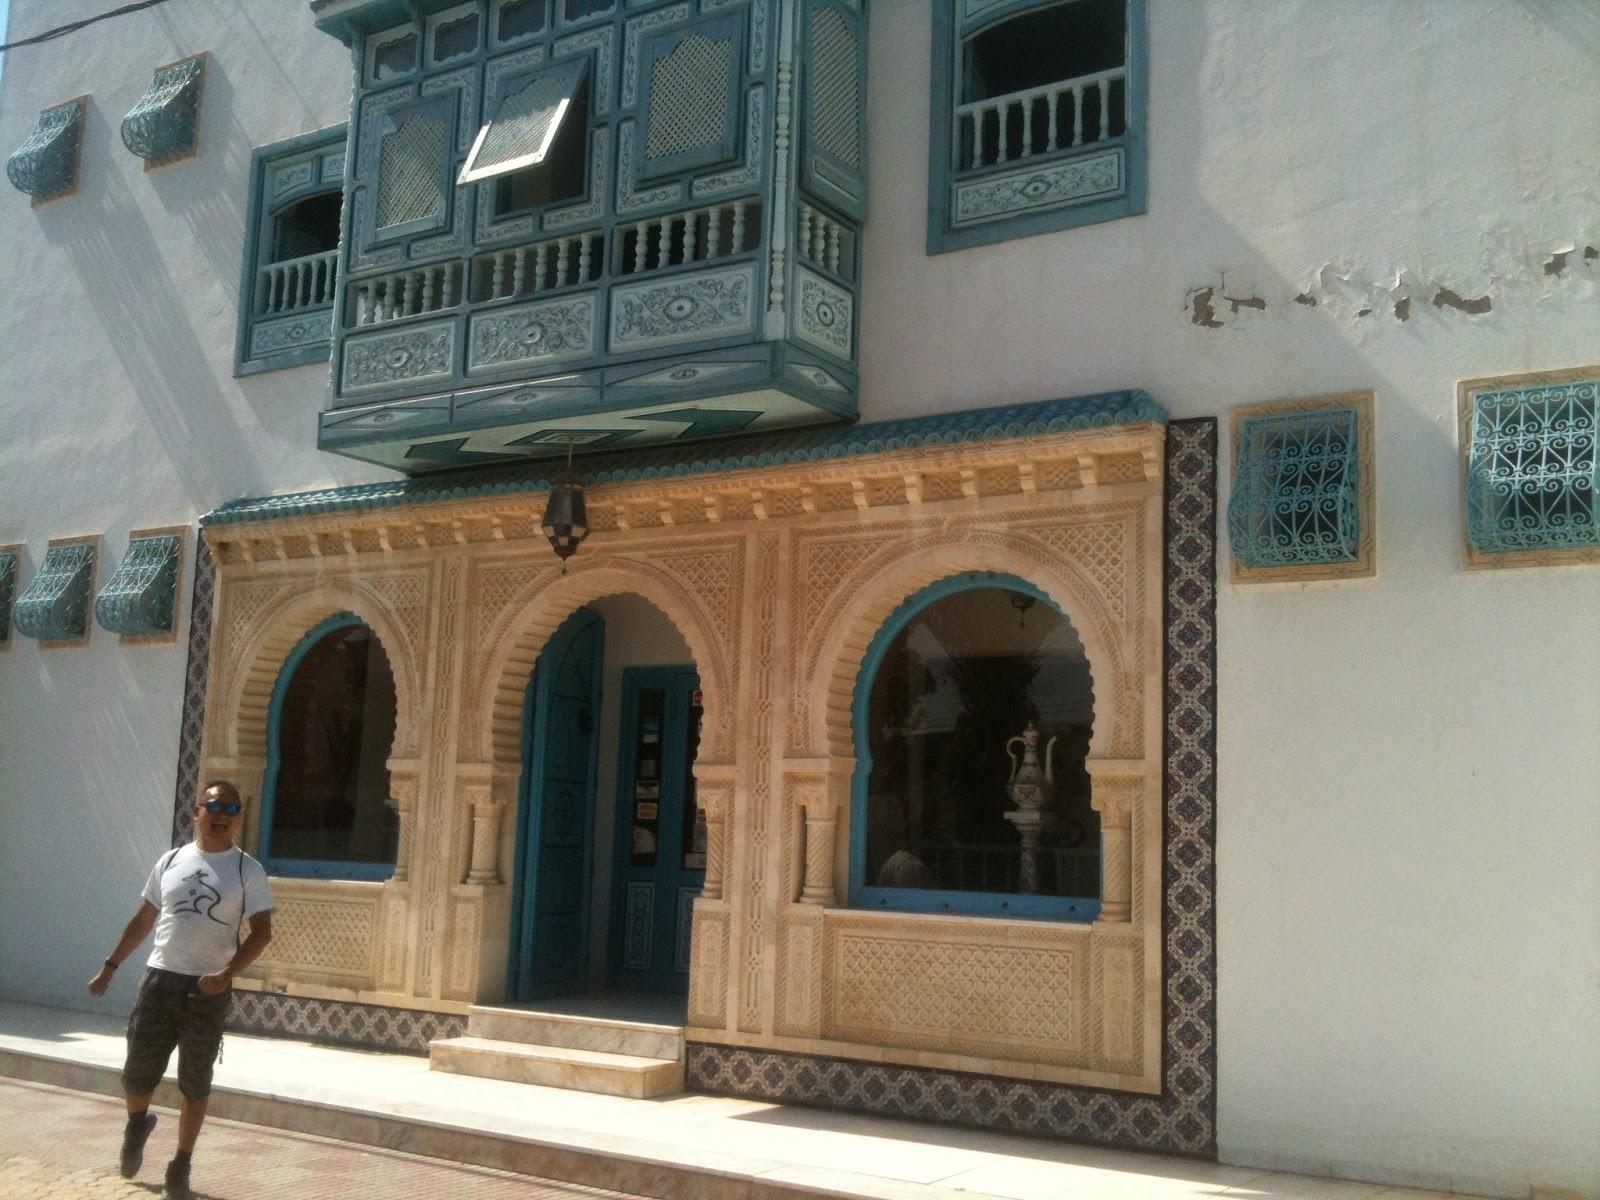 Kairouan Tunisia Tourism in Kairouan Tunisia Last